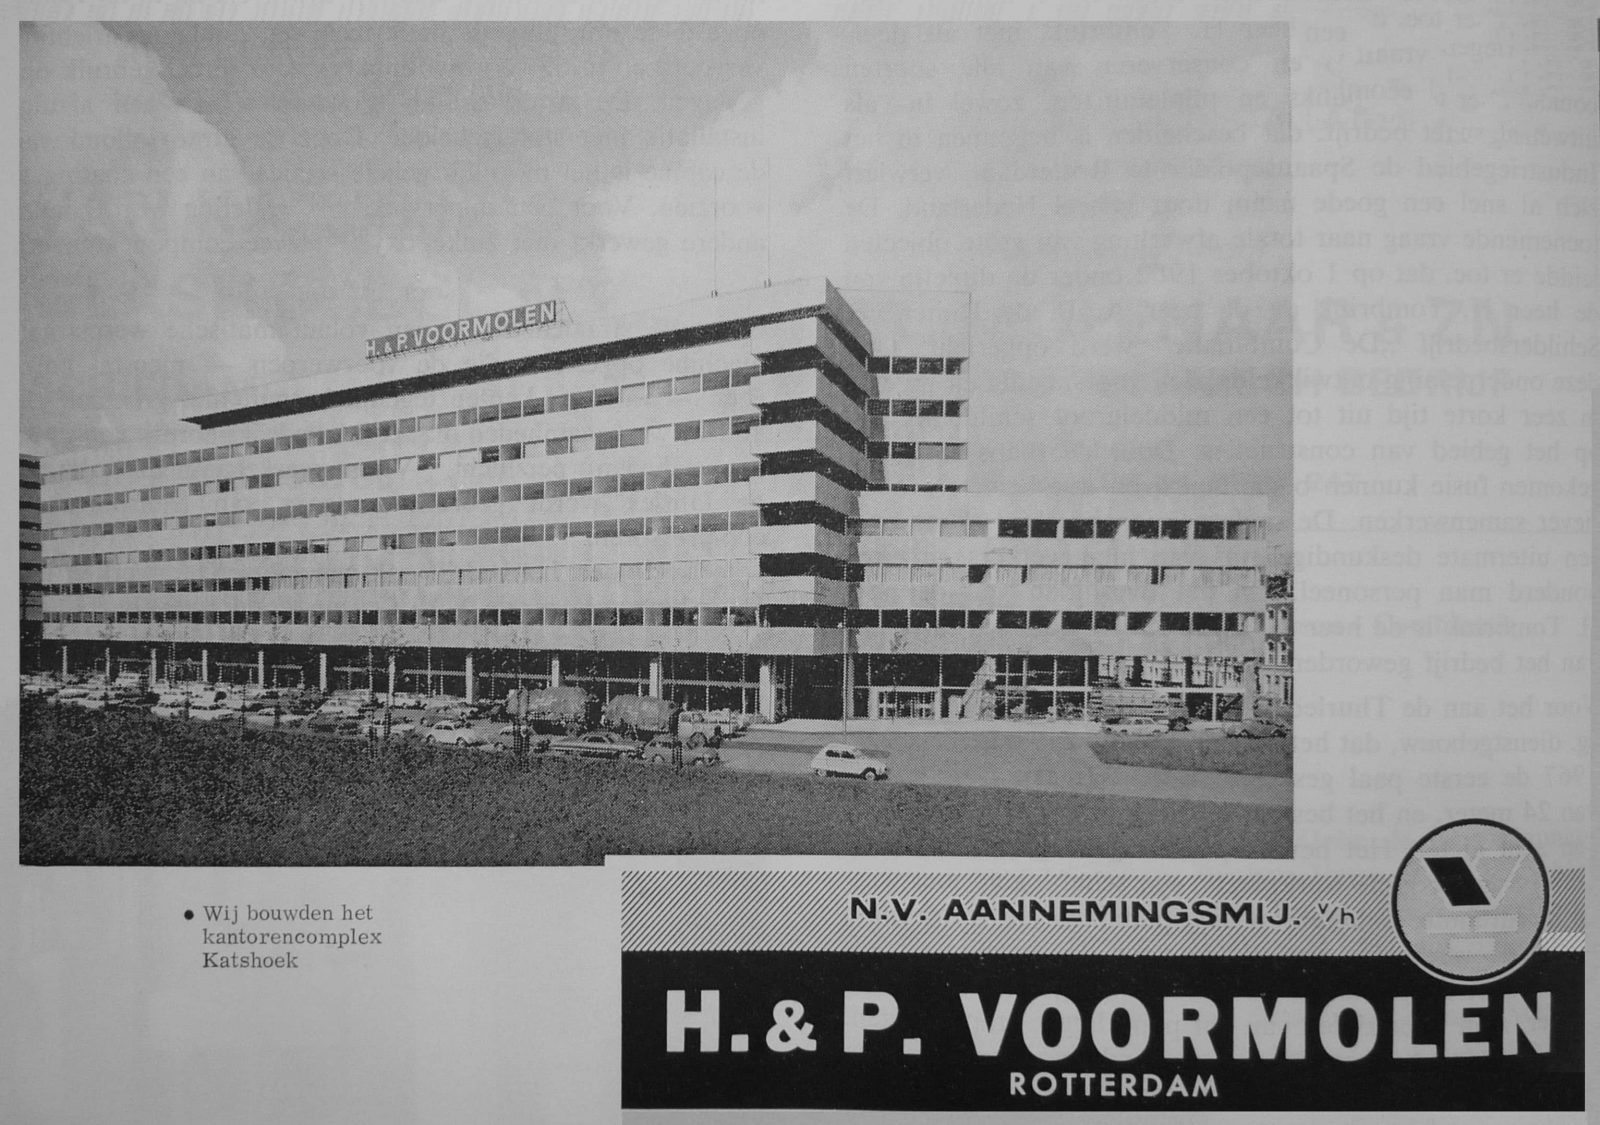 Katshoek-Stedenbouw-1968-11-12e